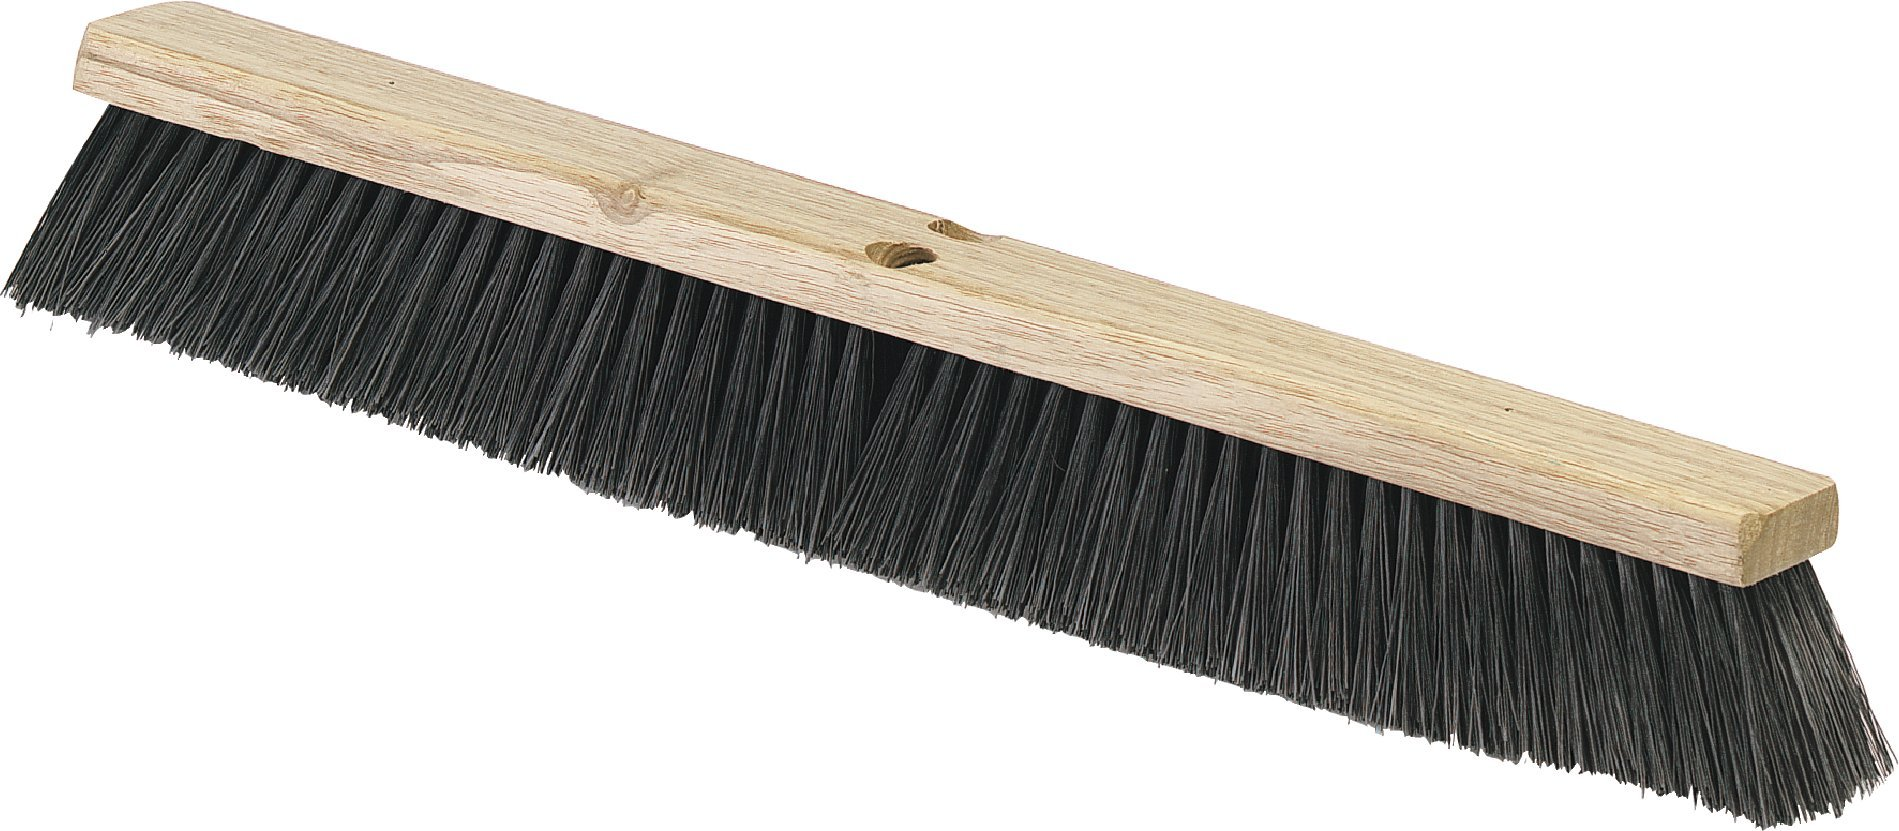 Carlisle 4507303 Flo-Pac Fine/Medium Floor Sweep, Polypropylene Bristles, 24'' Length, 3'' Bristle Trim, Black (Case of 12)